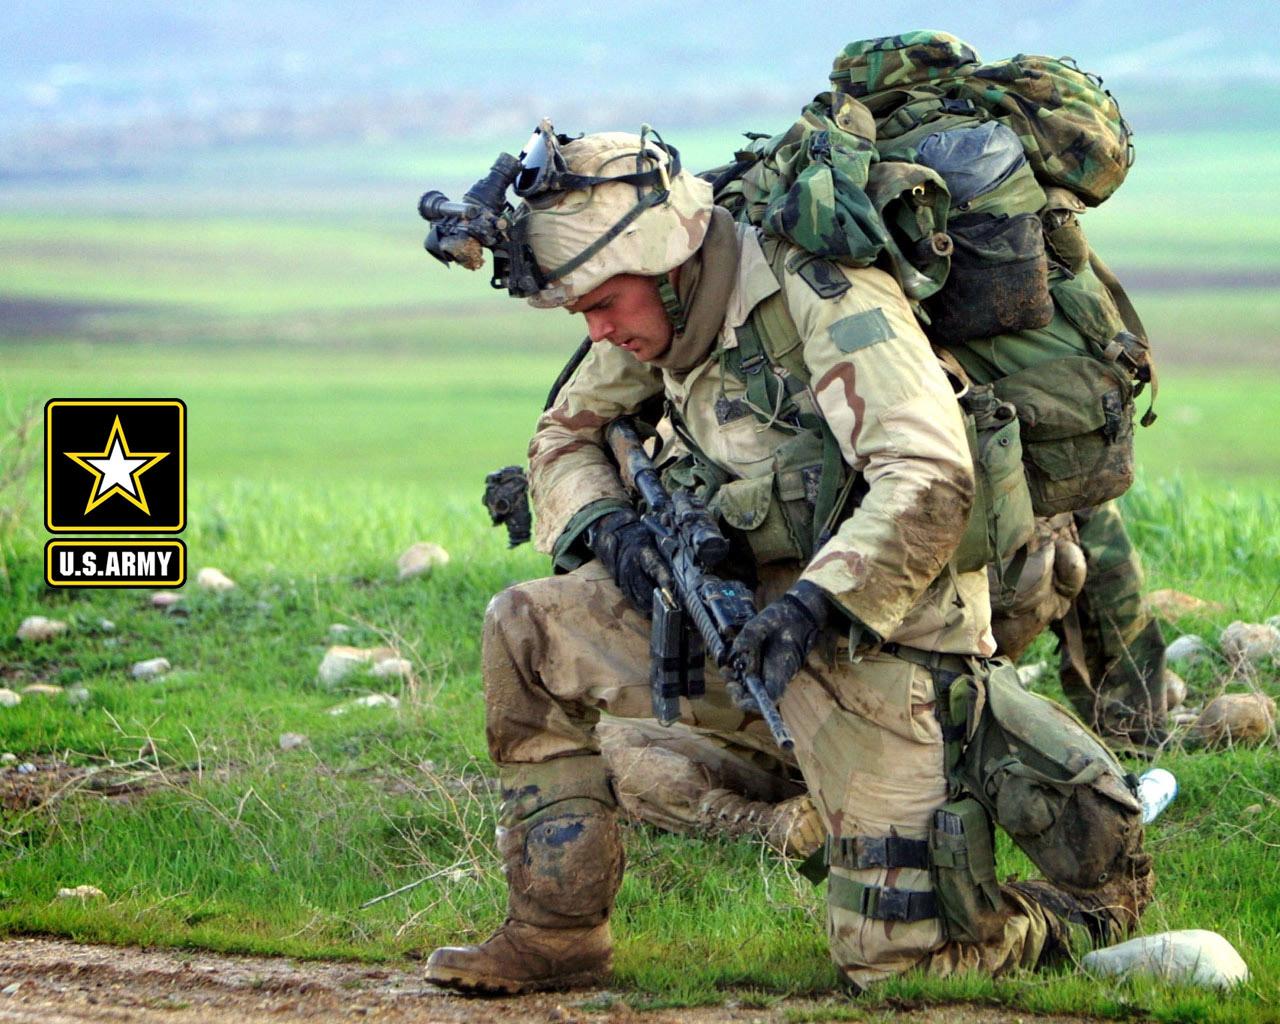 US Army 1280x1024